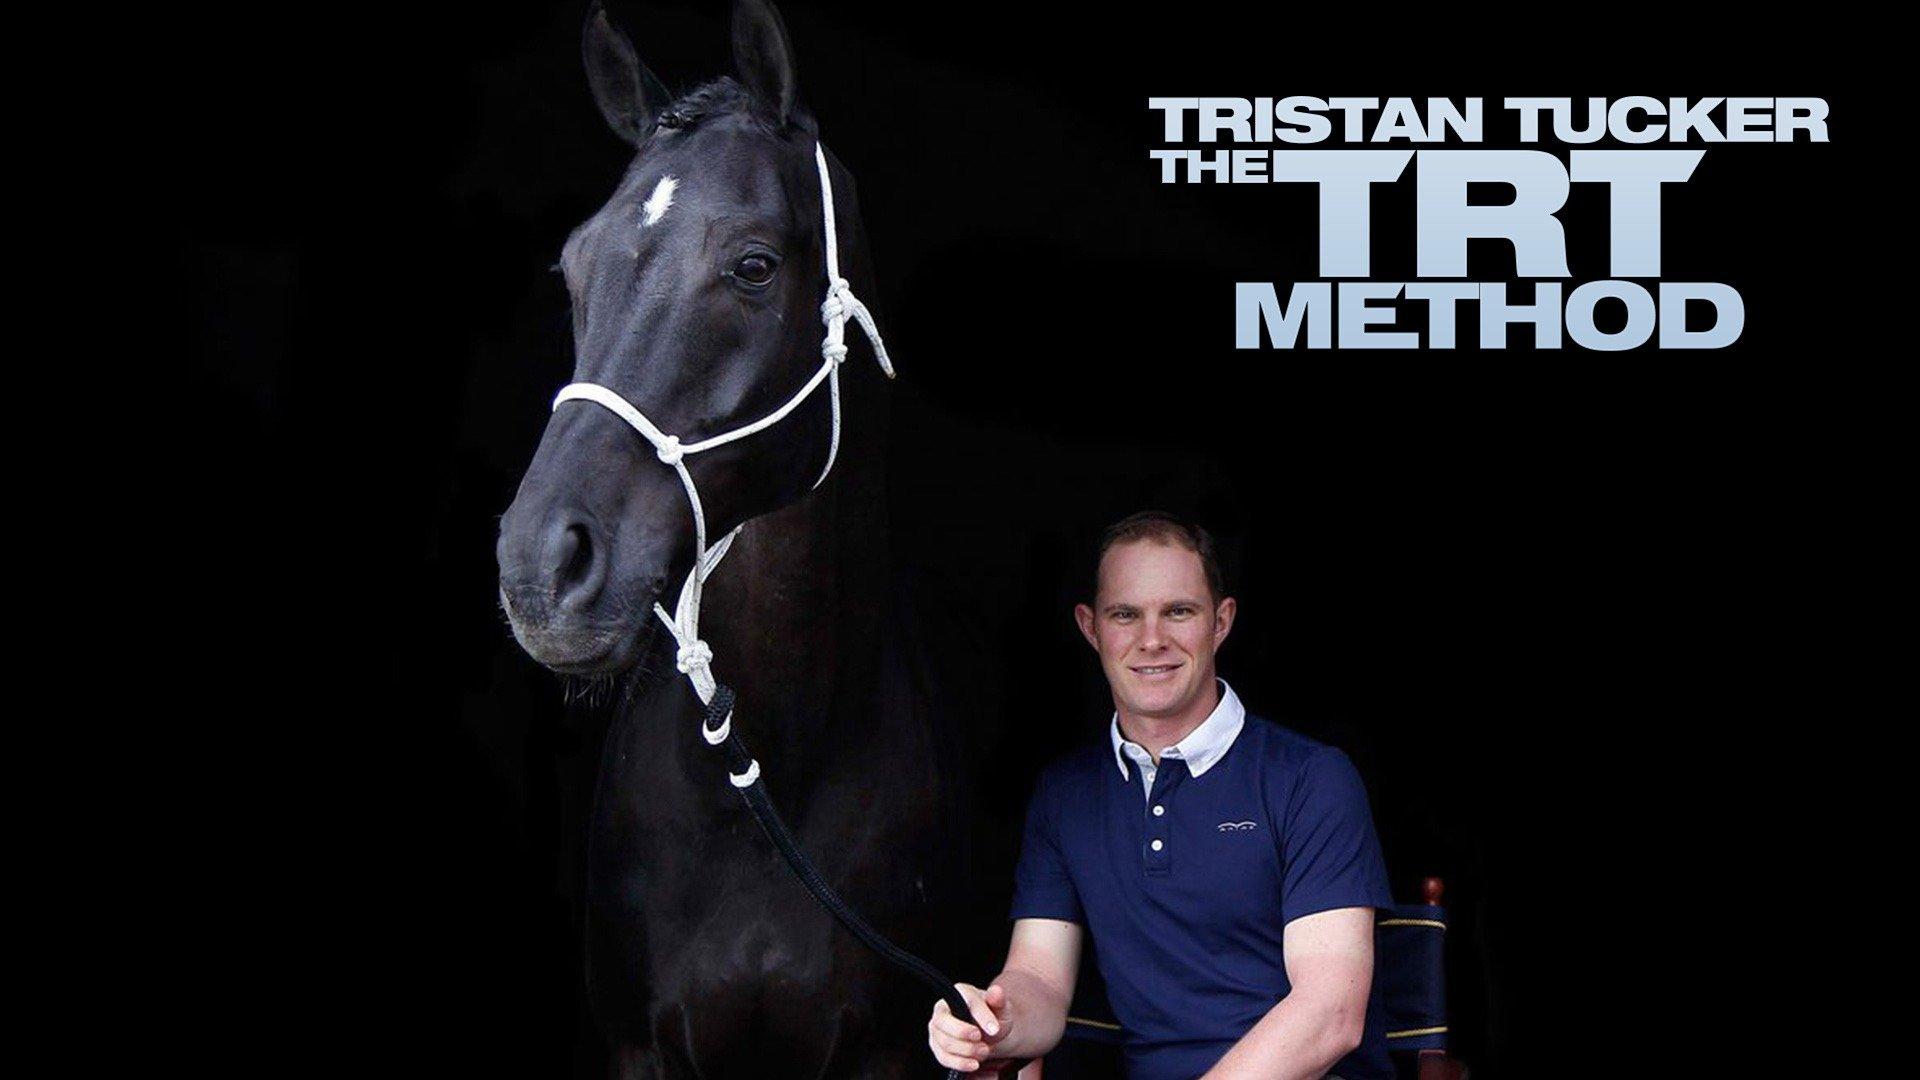 Tristan Tucker: The TRT Method